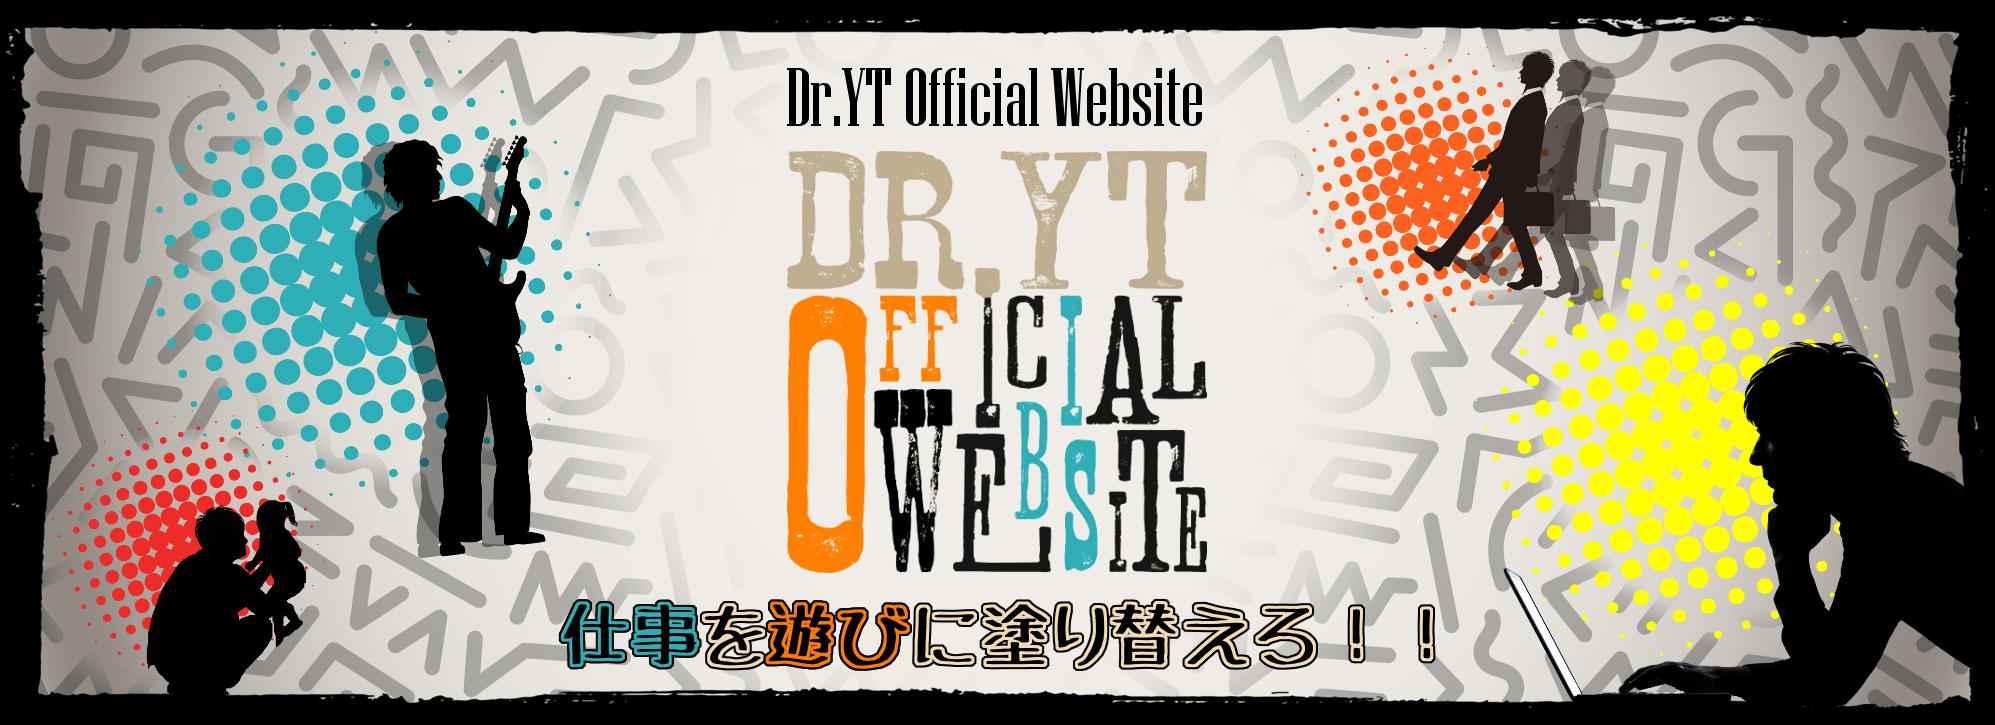 Dr.YTのネットビジネス入門